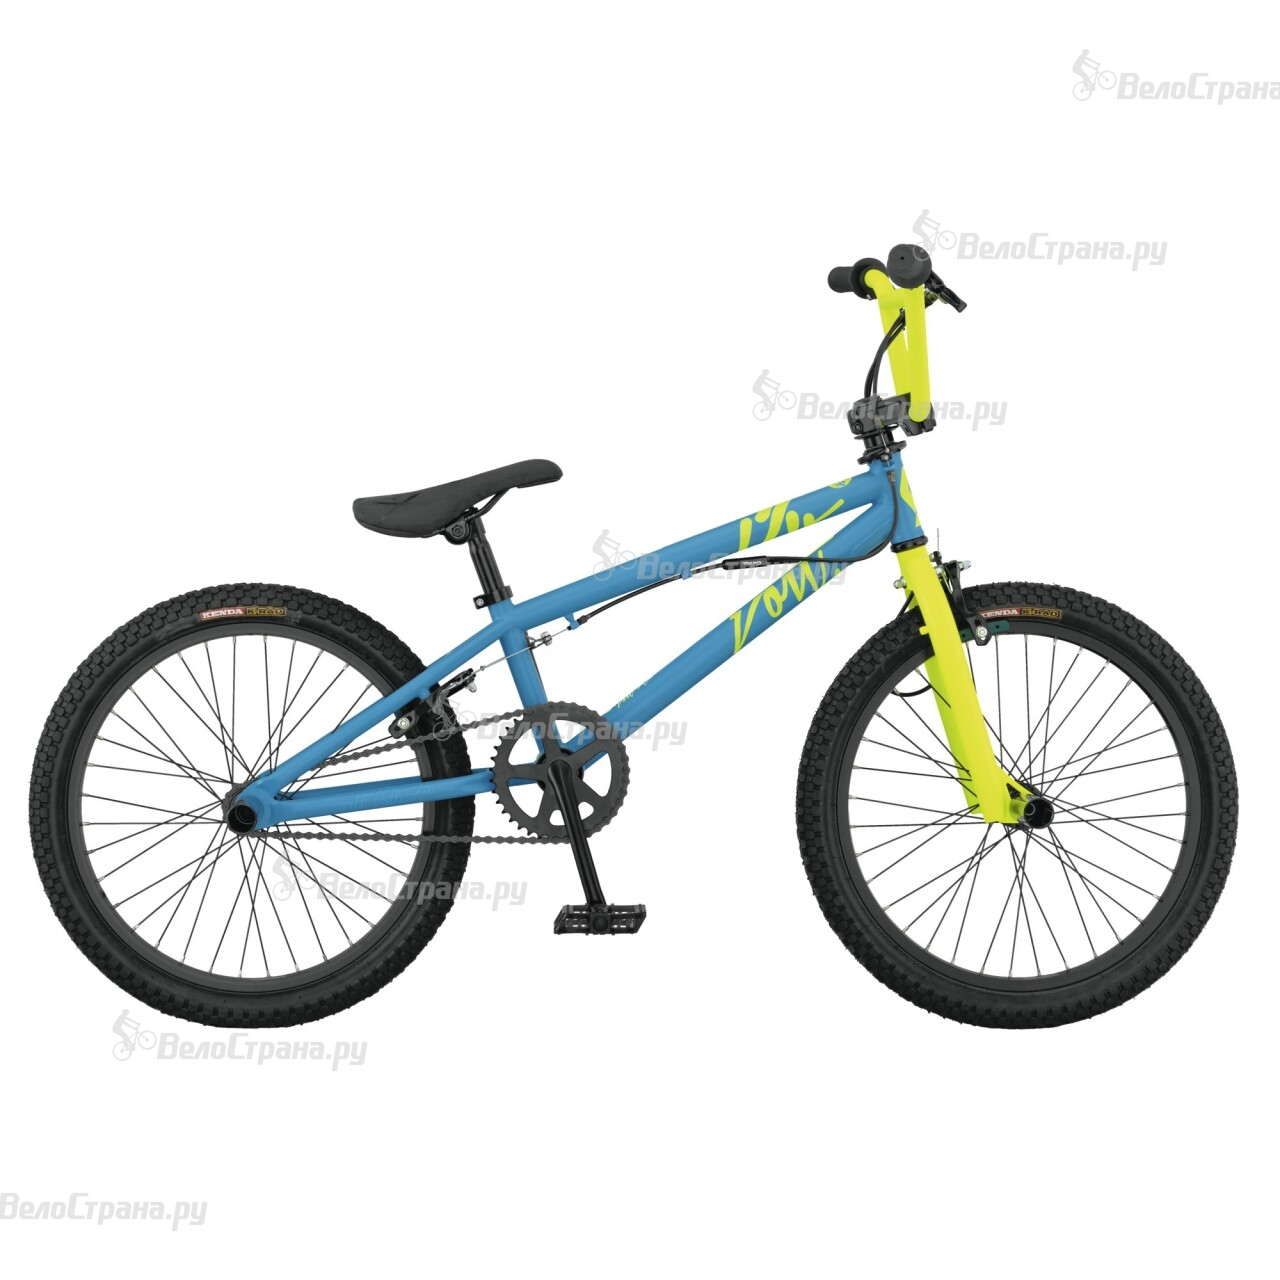 Велосипед Scott Volt-X 30 (2015)